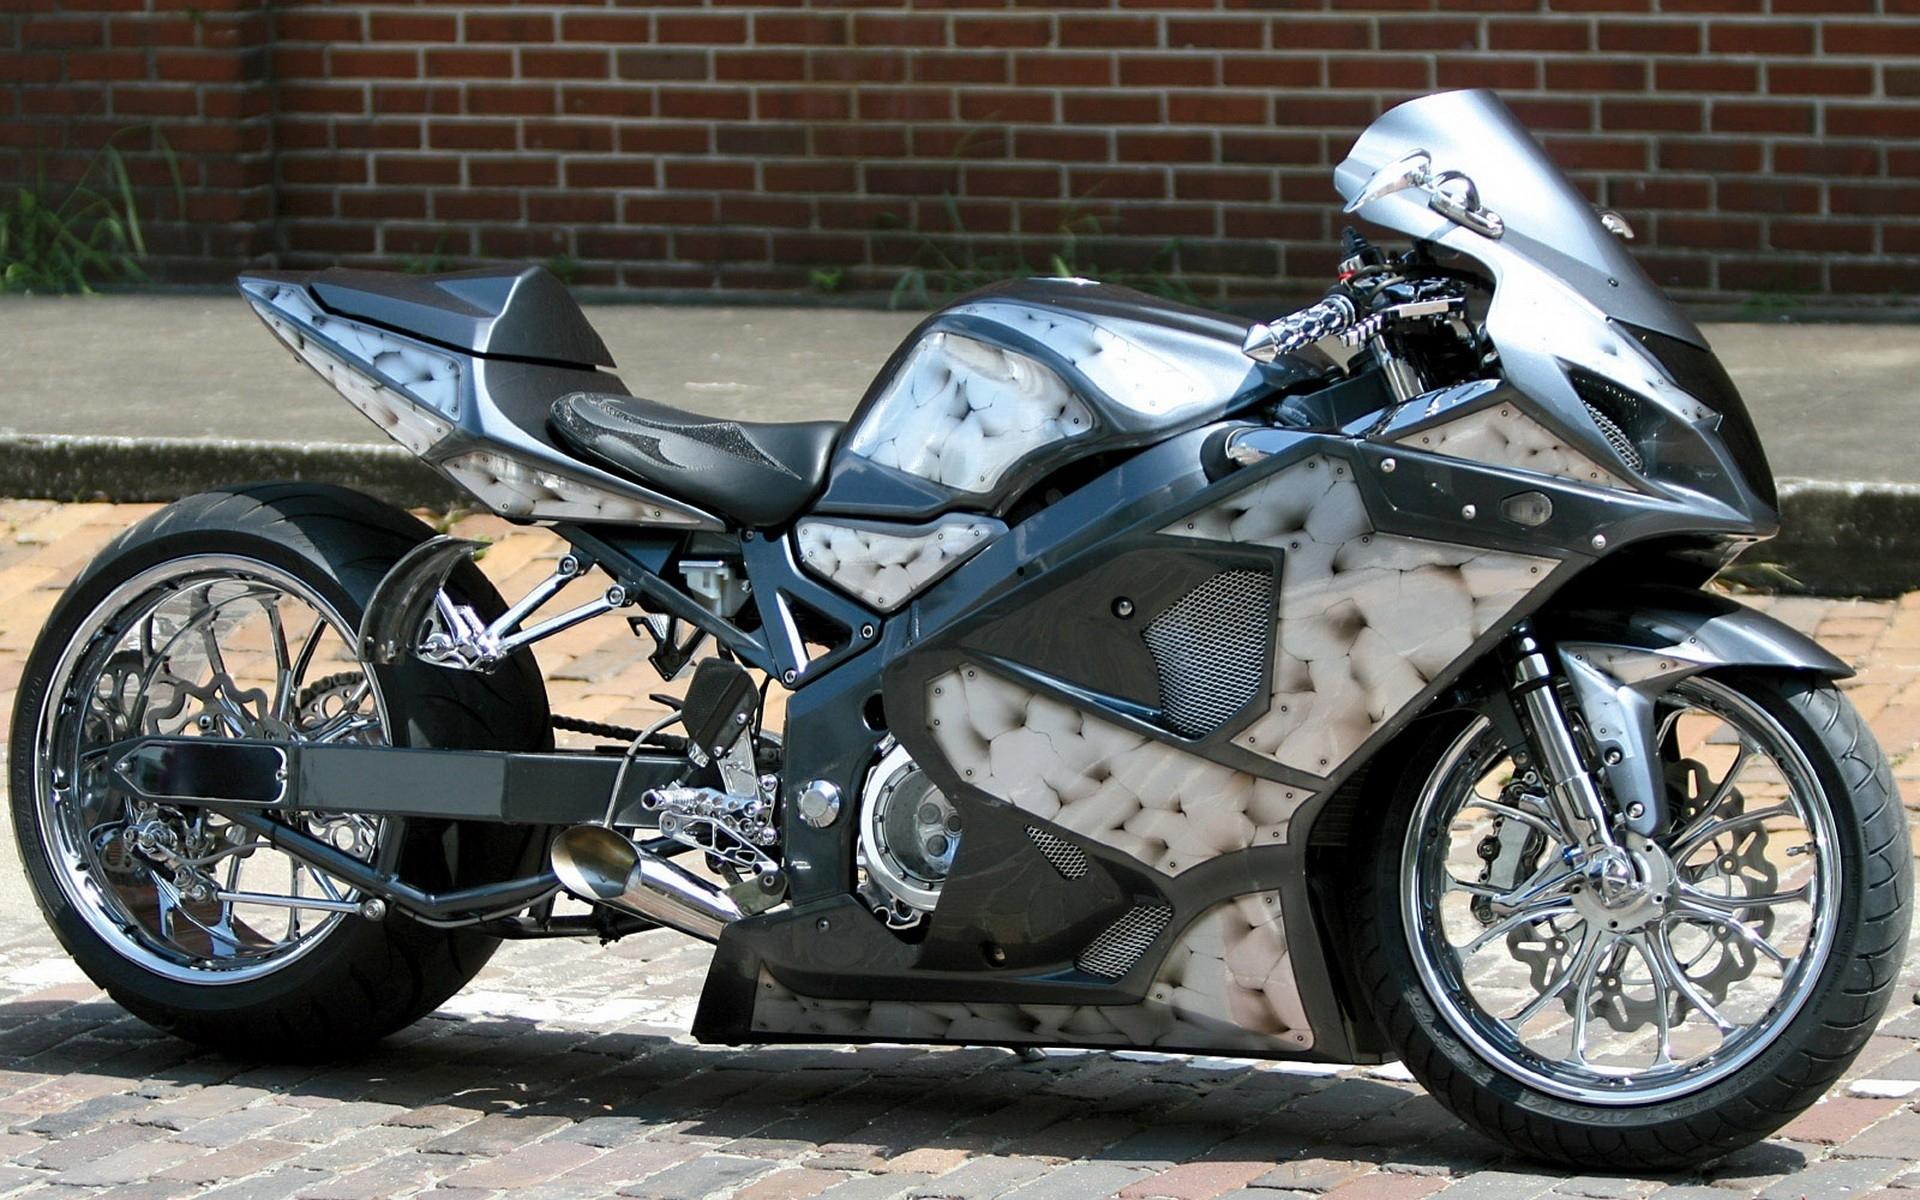 hayabusa tuning motorbikes 2560 - photo #12